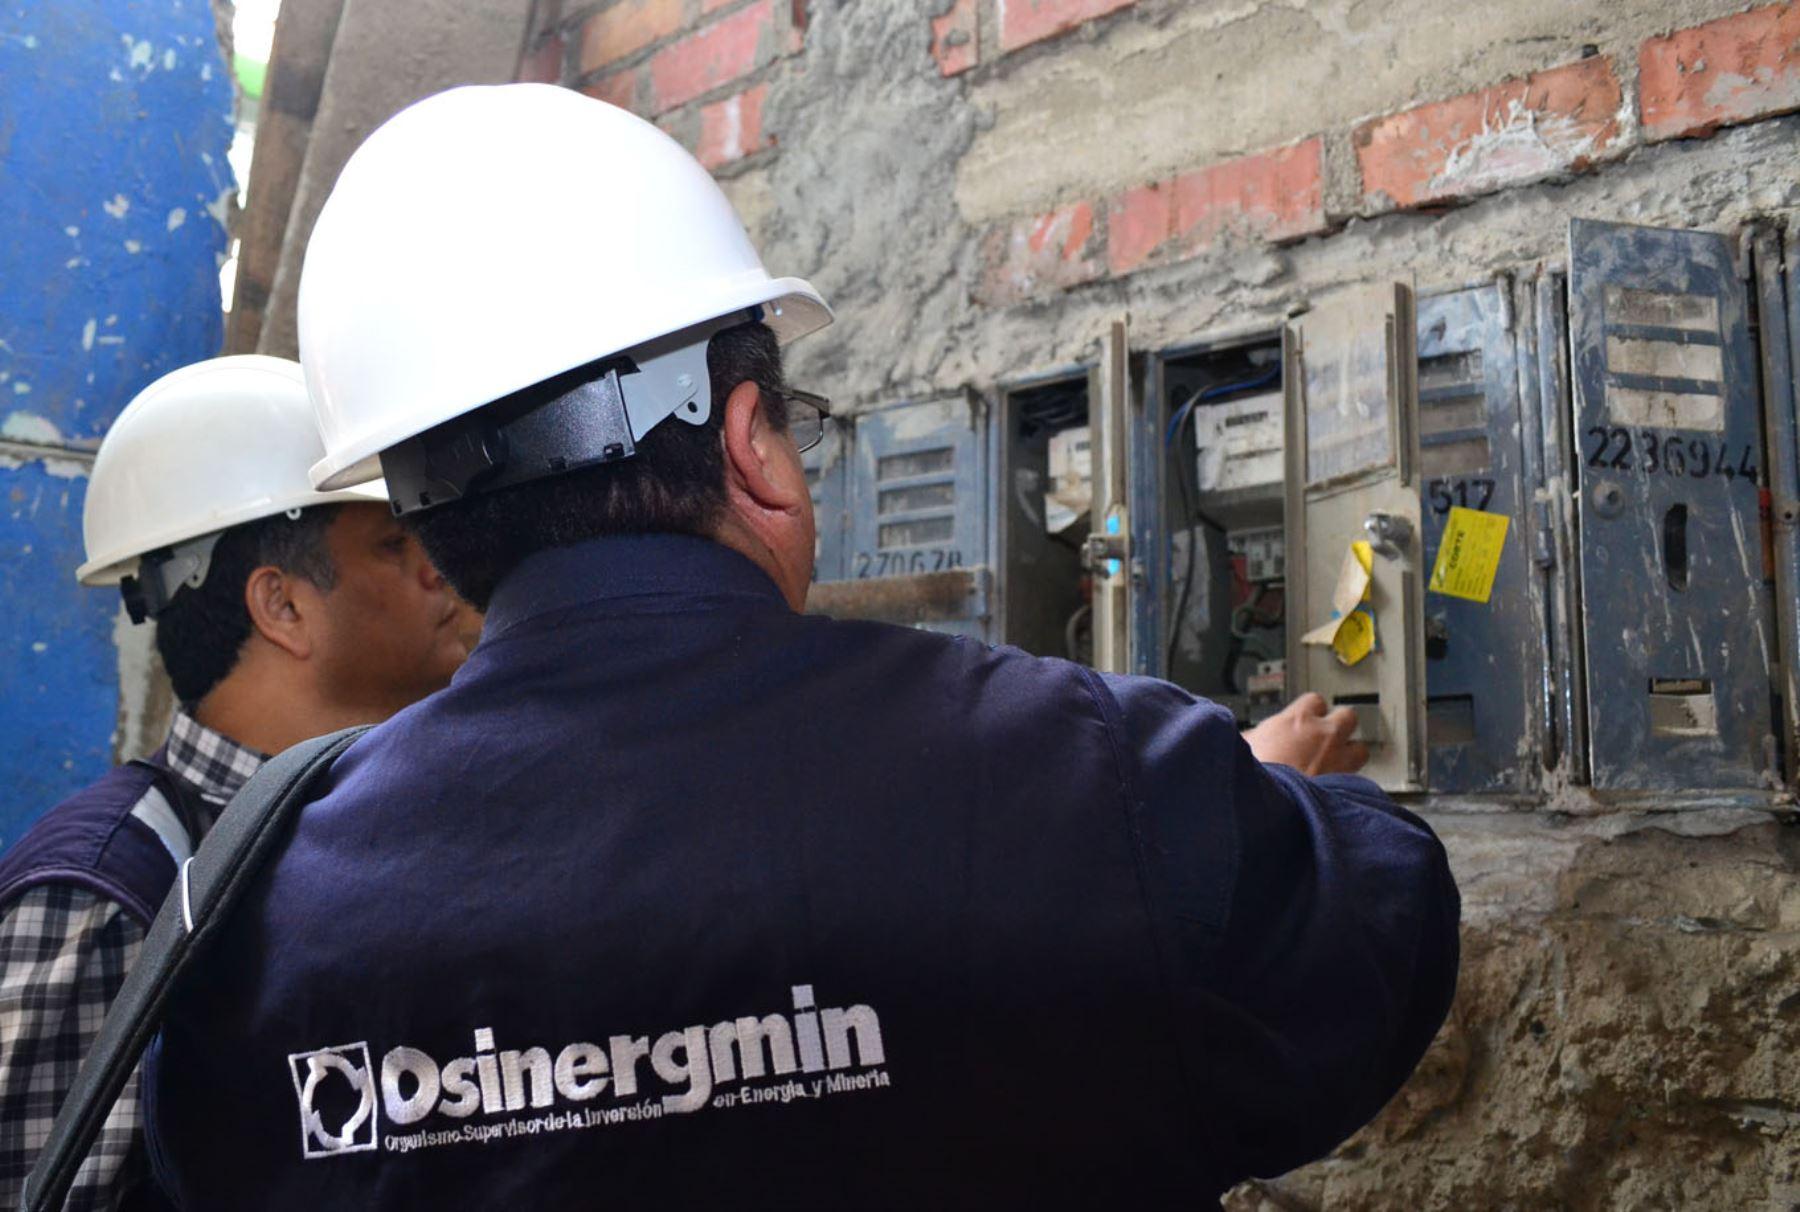 Osinergmin actualiza tarifas eléctricas en función a factores macroeconómicos